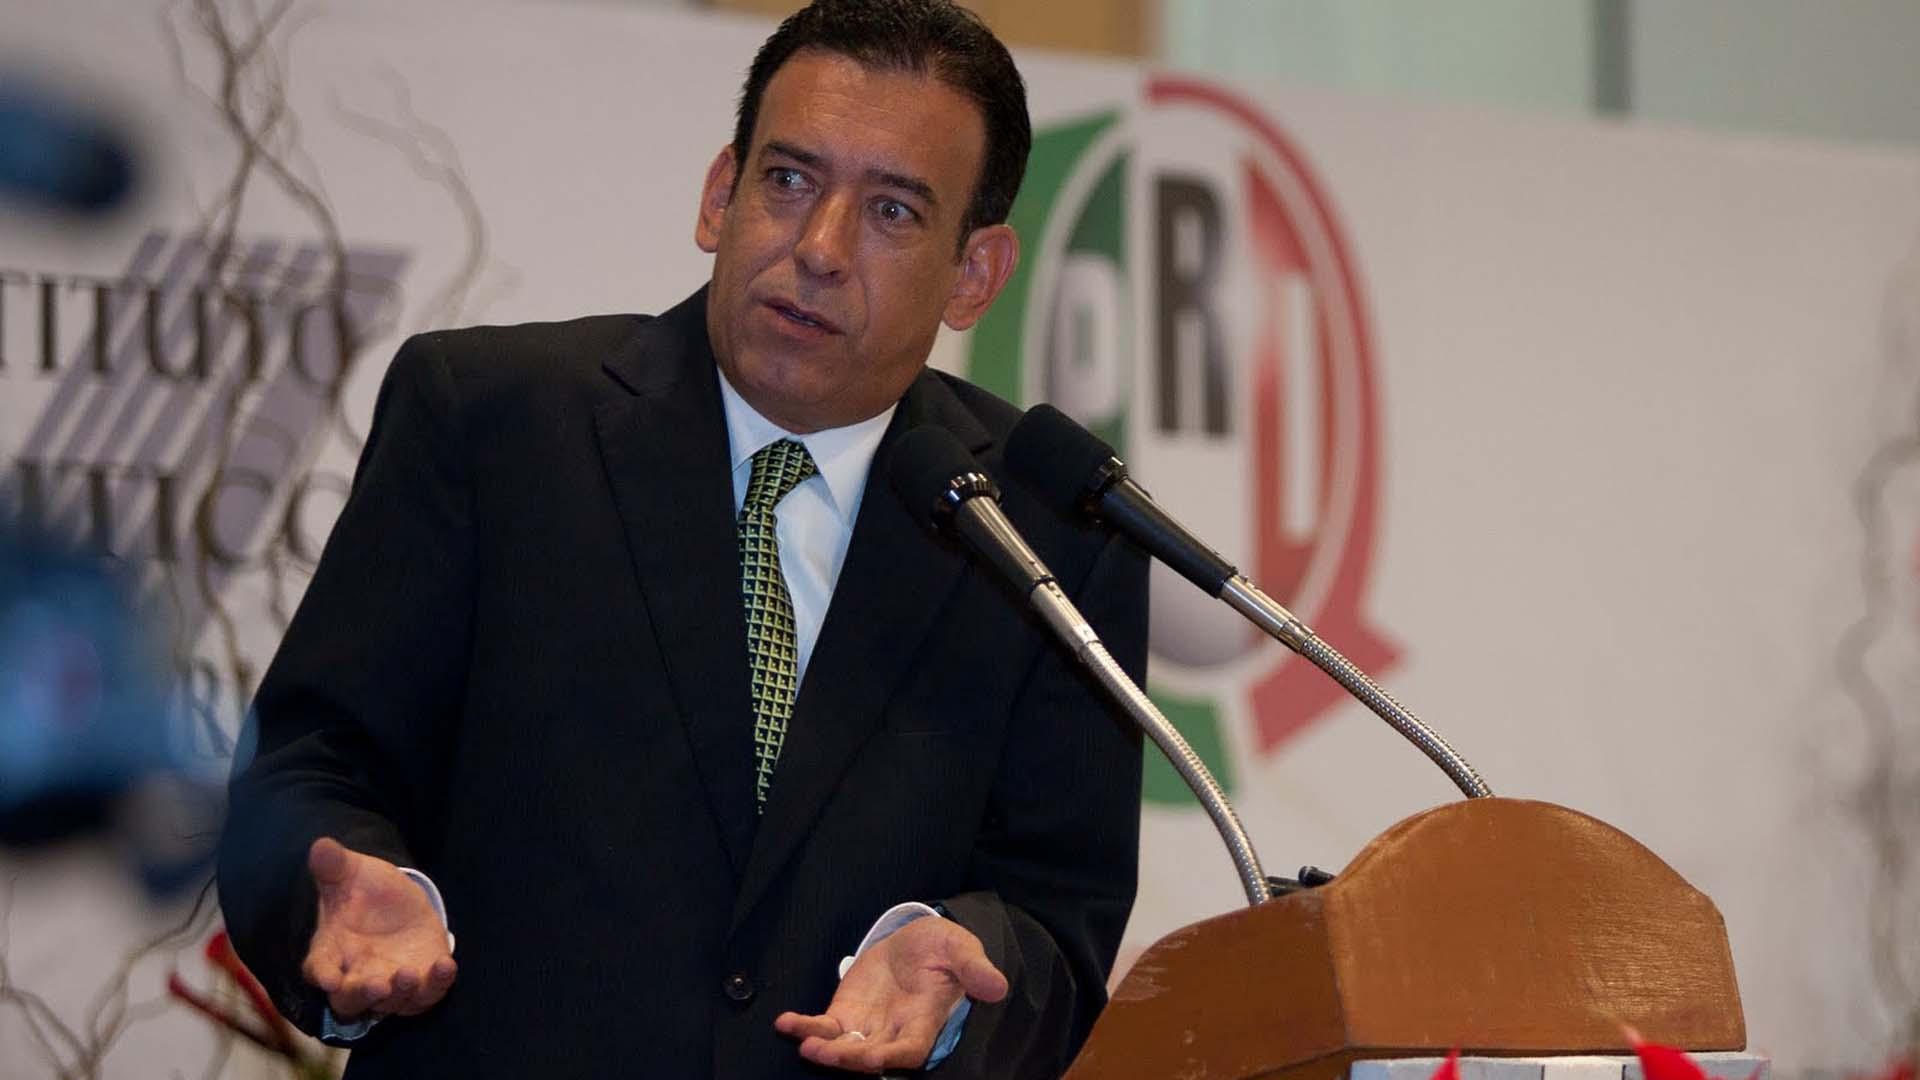 Humberto Moreira, automáticamente fuera del PRI